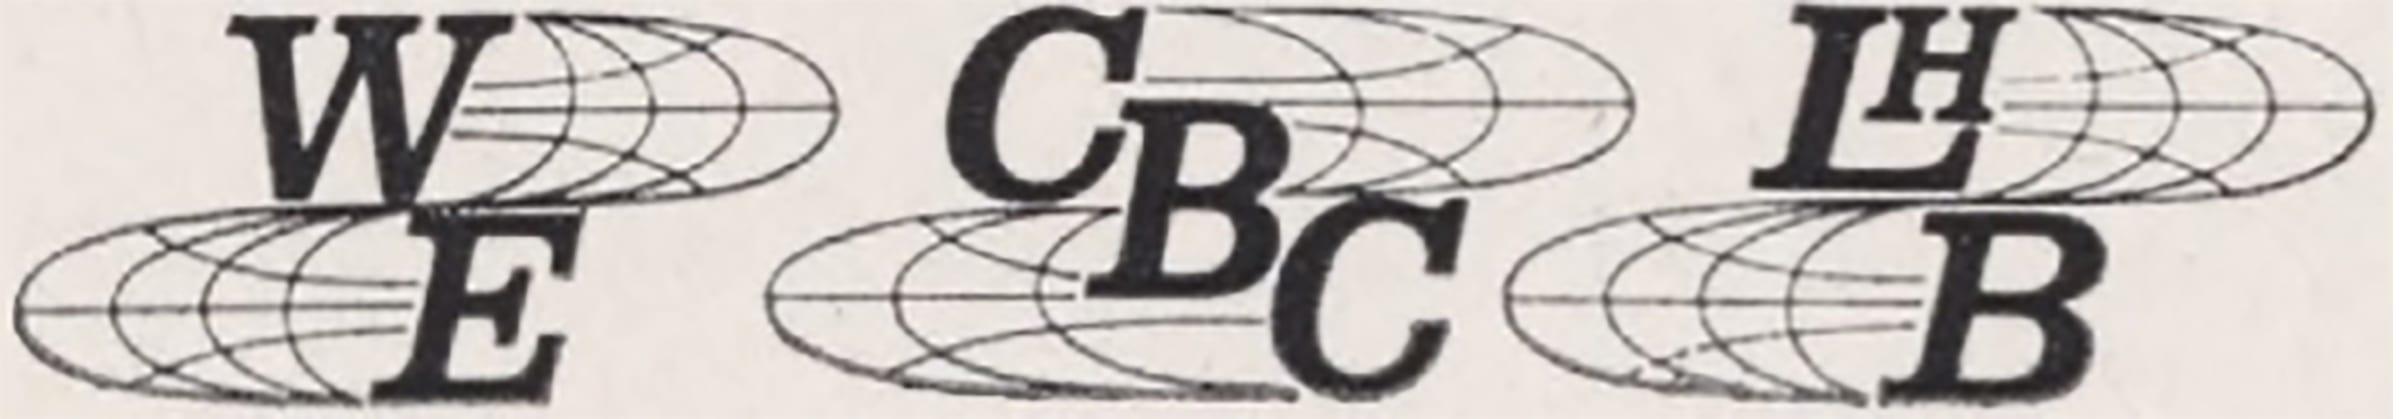 Logos WE, CBC, LHB.